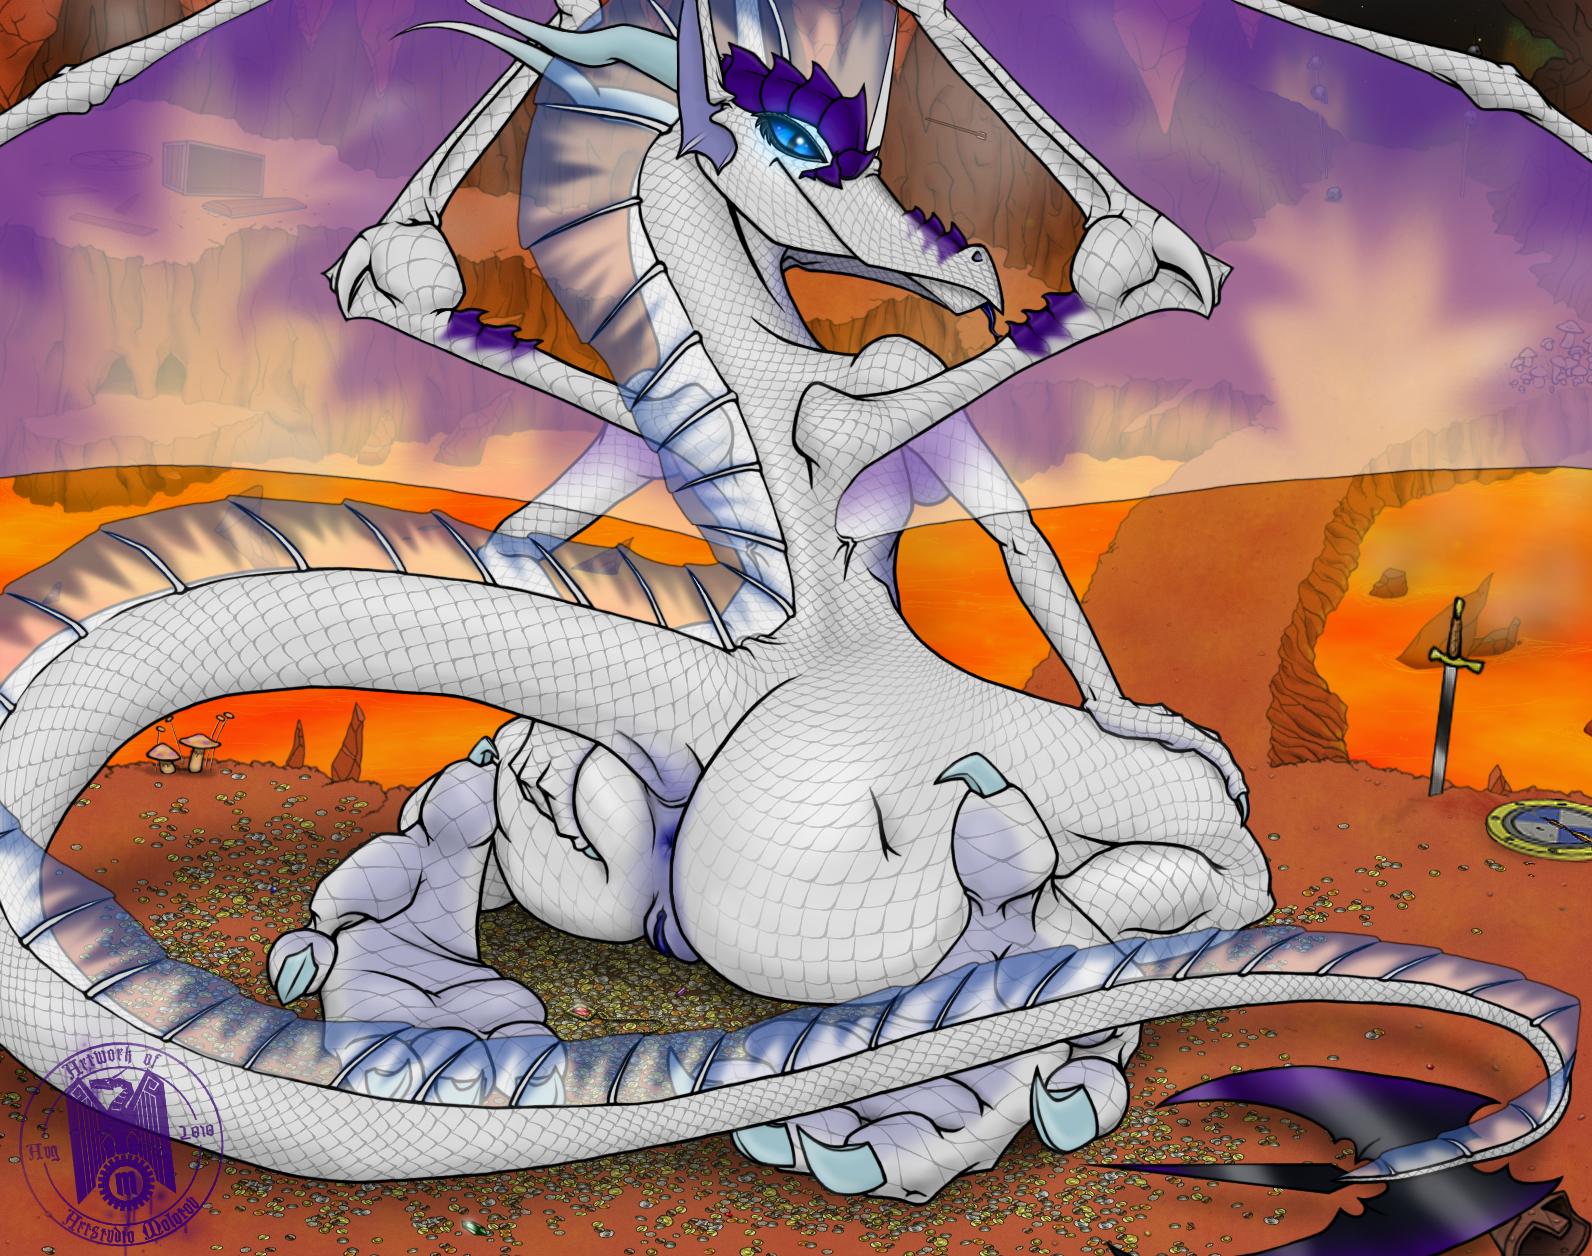 Дракон full hd hdtv fhd 1080p обои дракон картинки